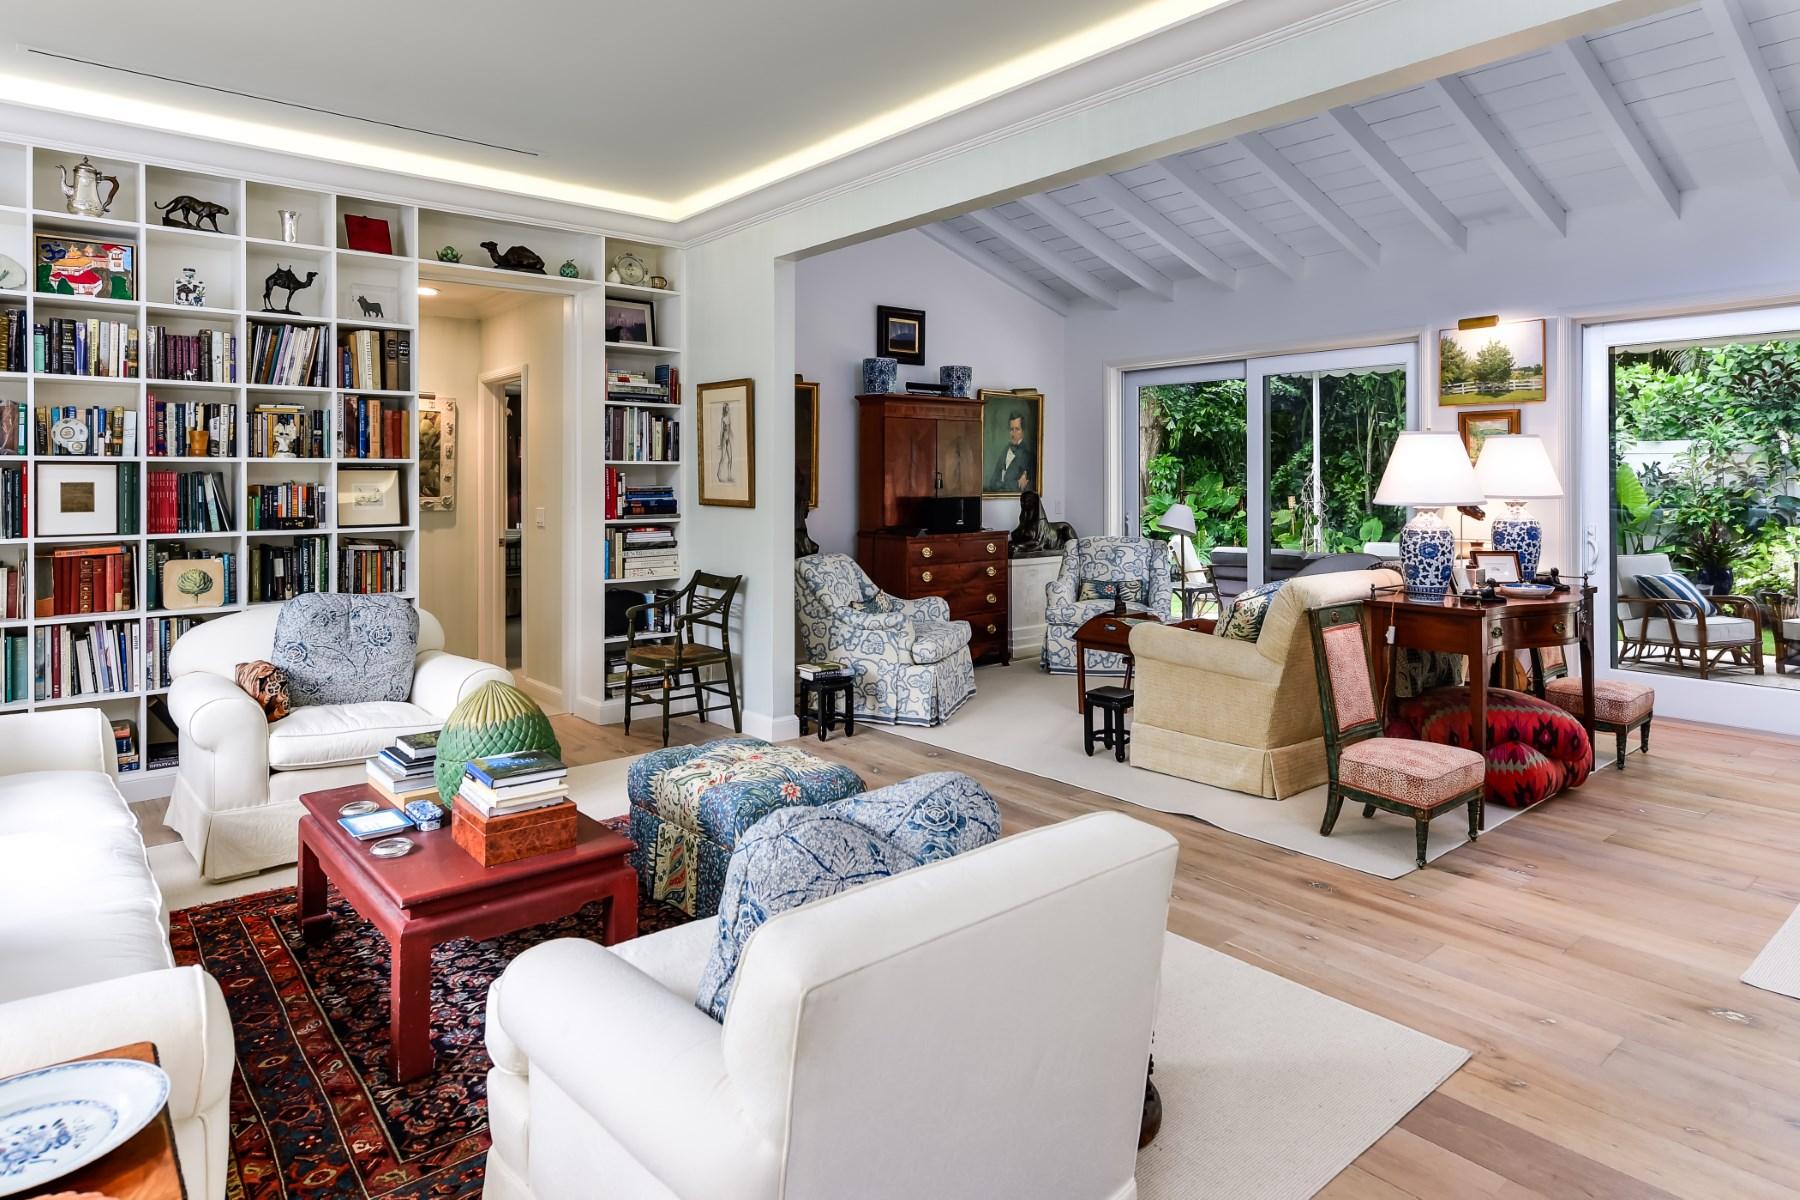 Villa per Vendita alle ore Immaculate Bermuda Home 212 Cherry Ln North End, Palm Beach, Florida, 33480 Stati Uniti